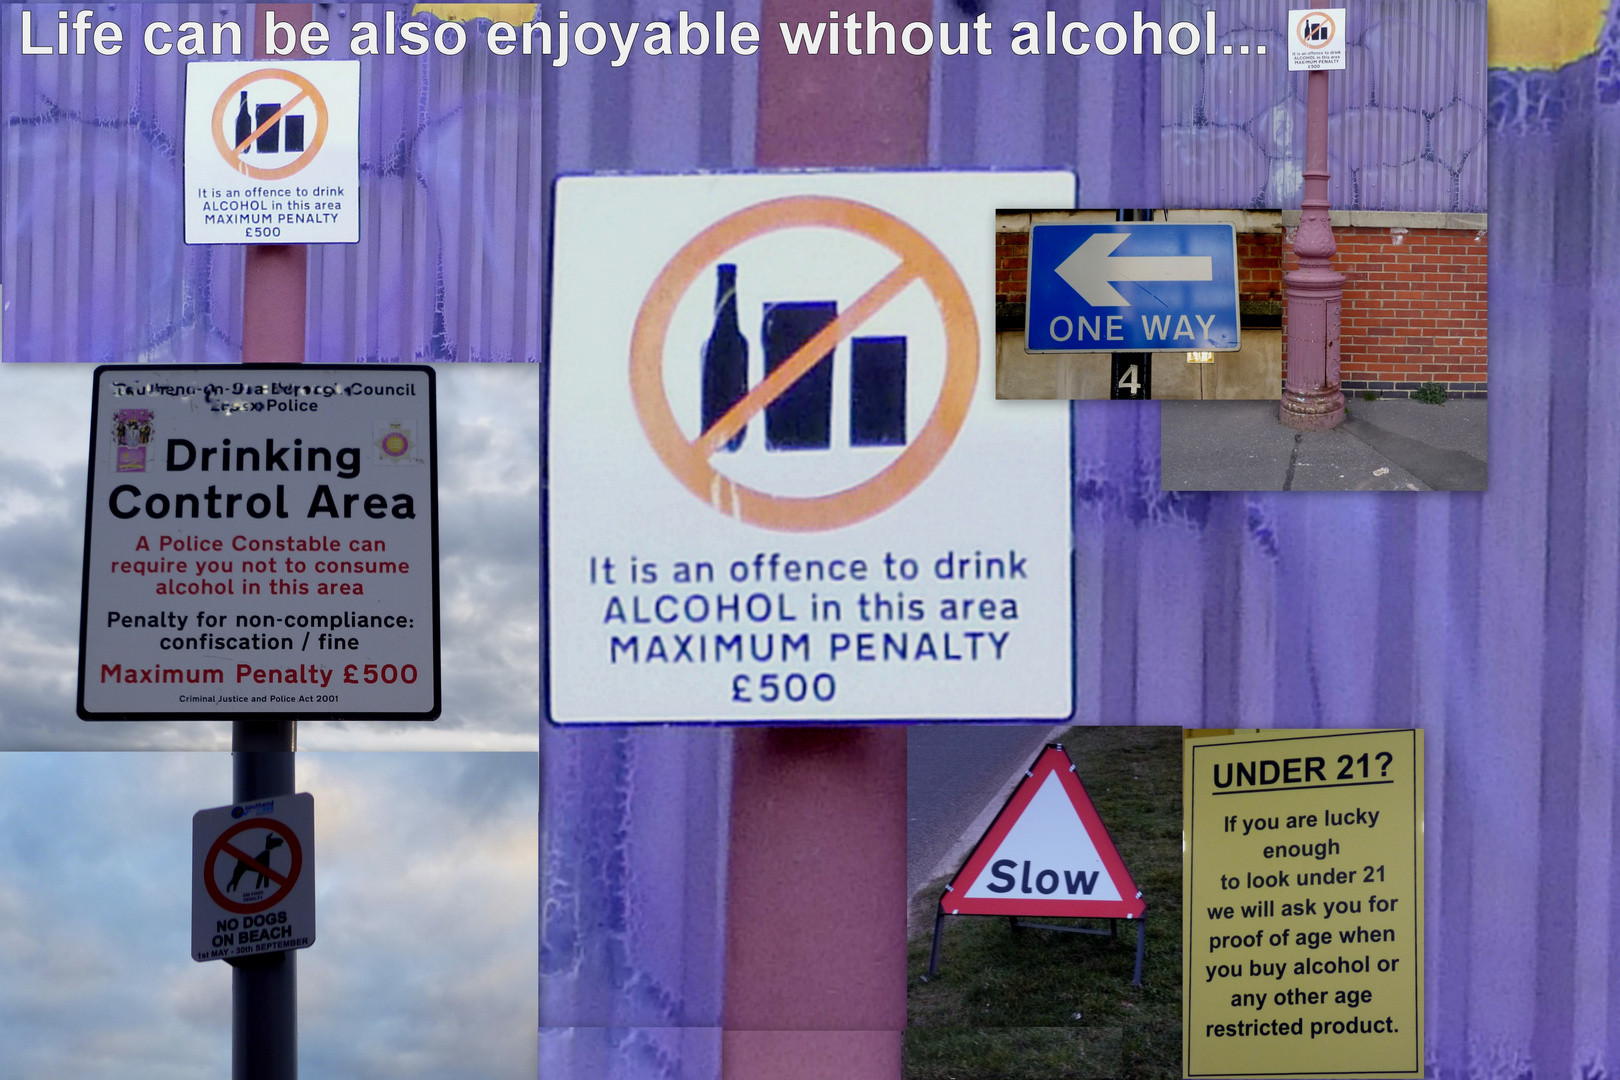 Alkoholverbot -  Prohibition